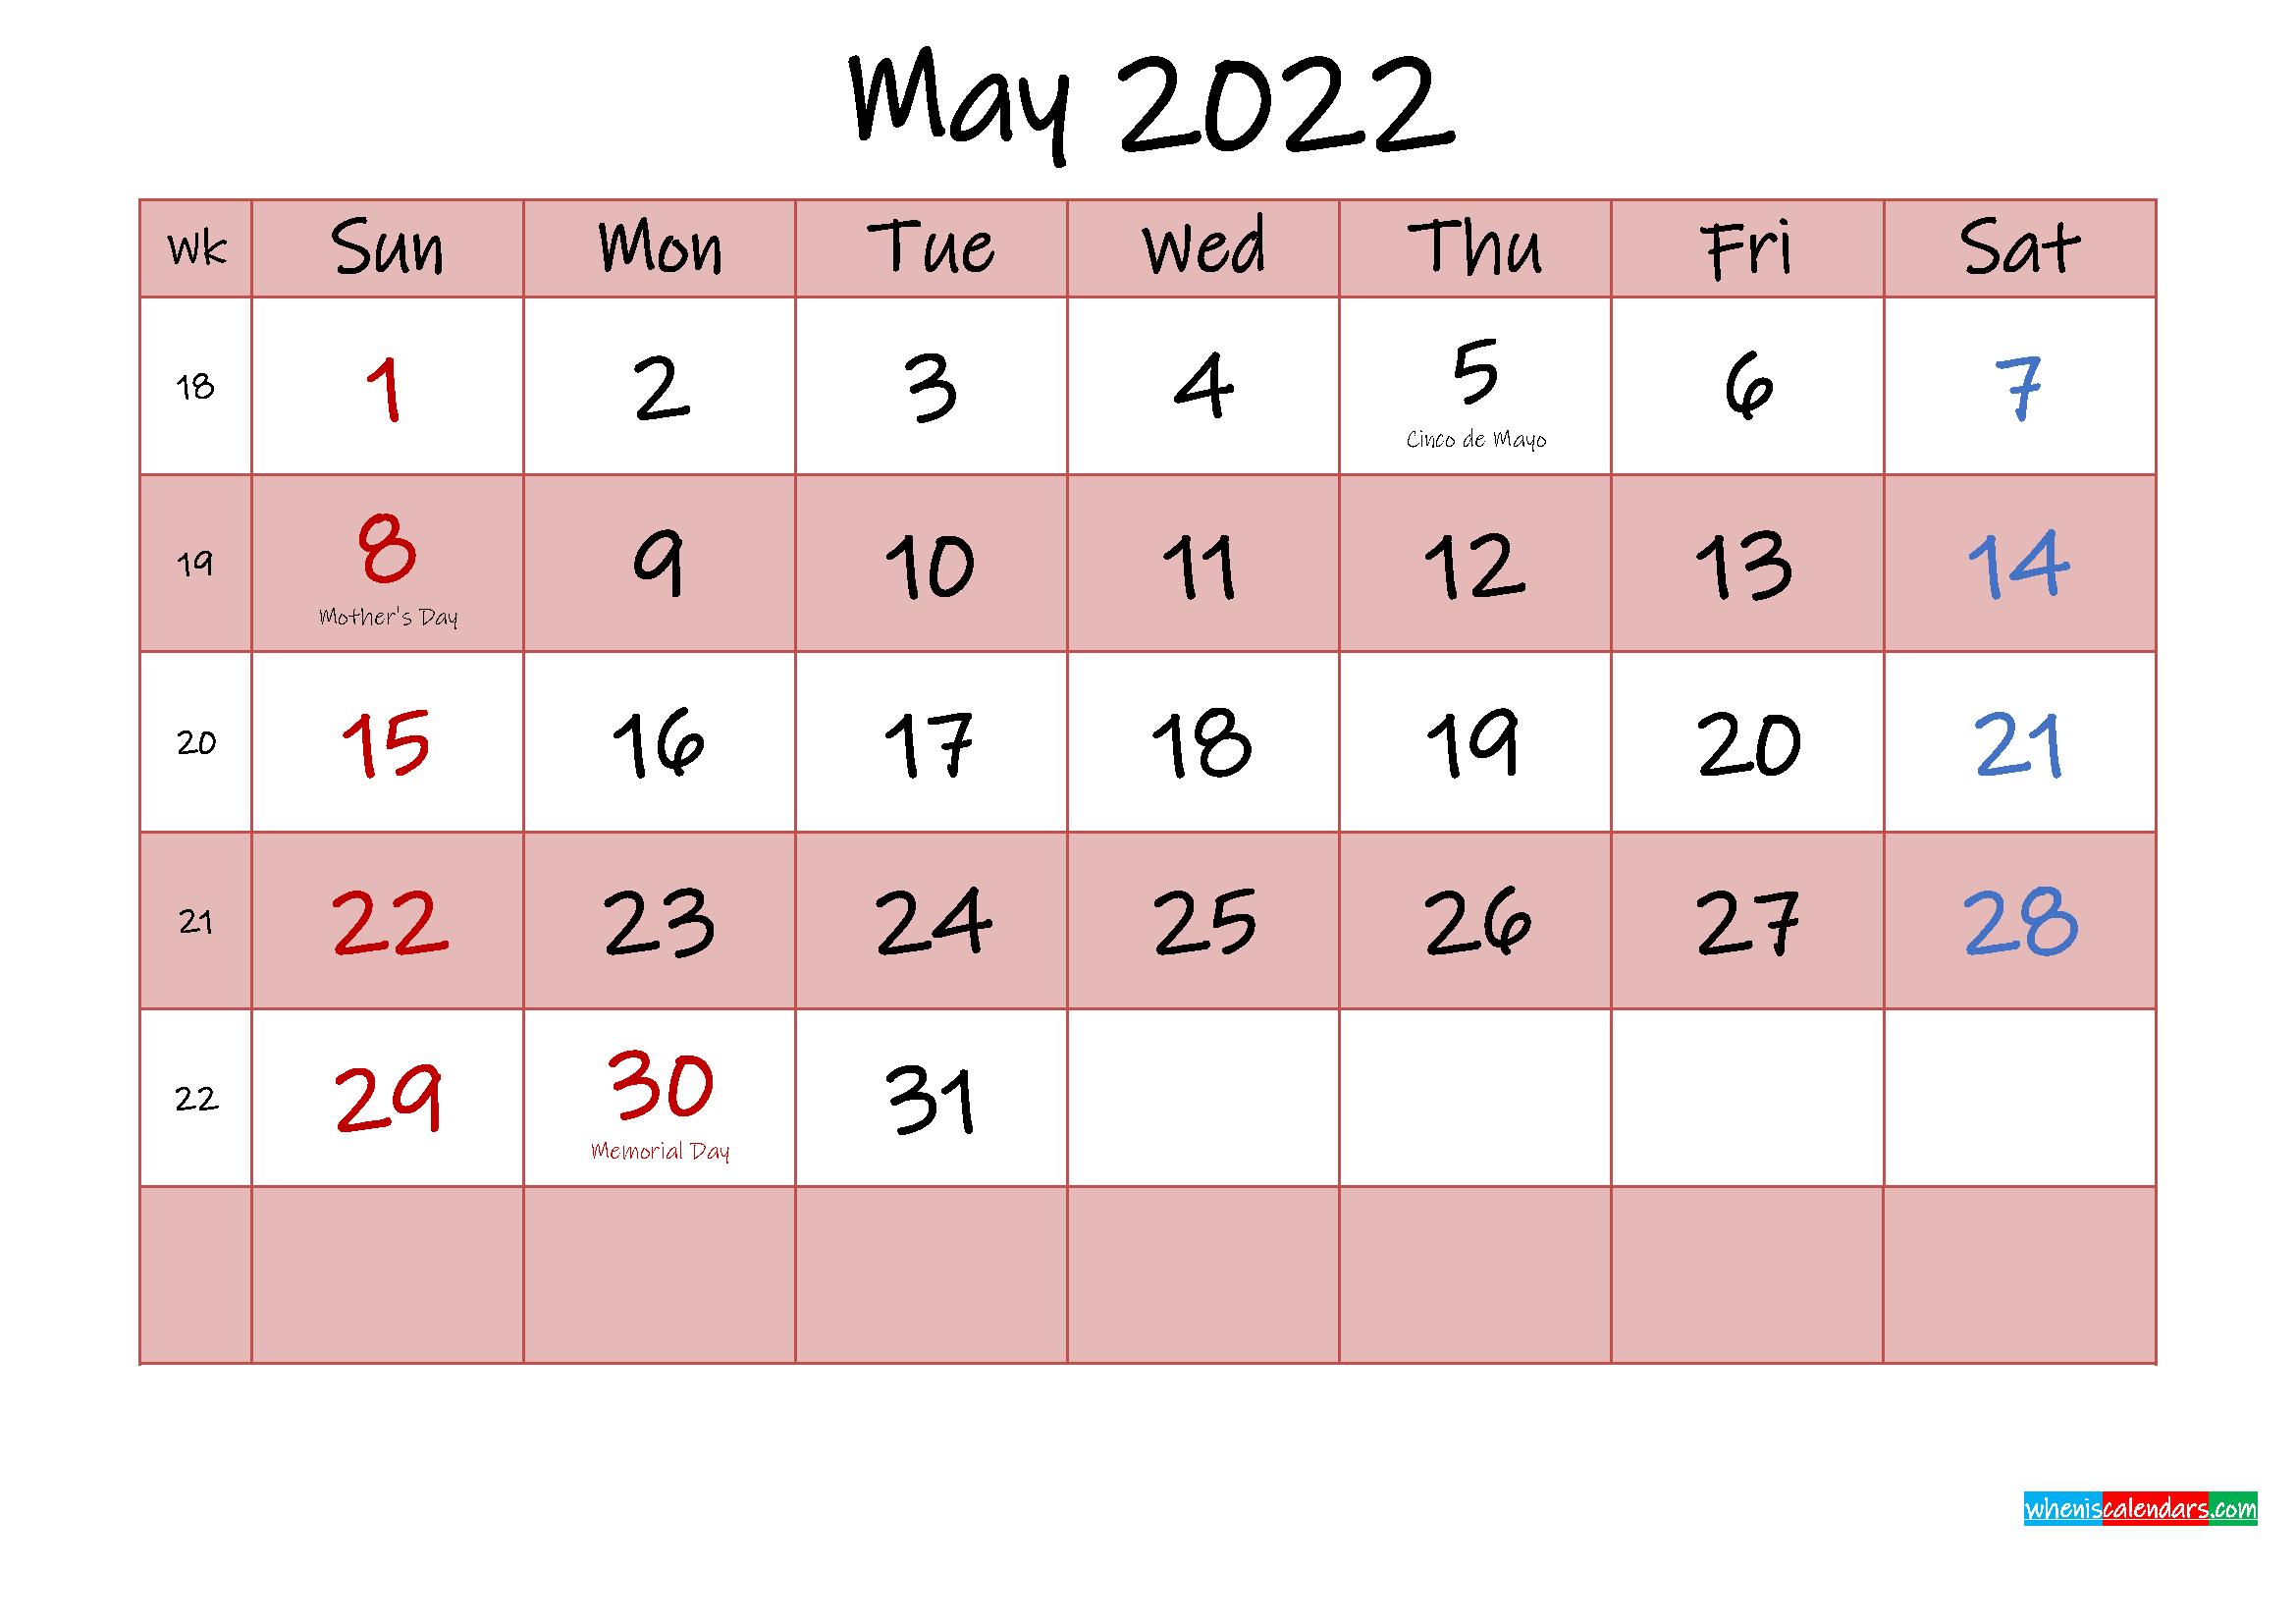 Free Printable Coloring Calendar 2022 May - Template No in May 2022 Calendar Template Image